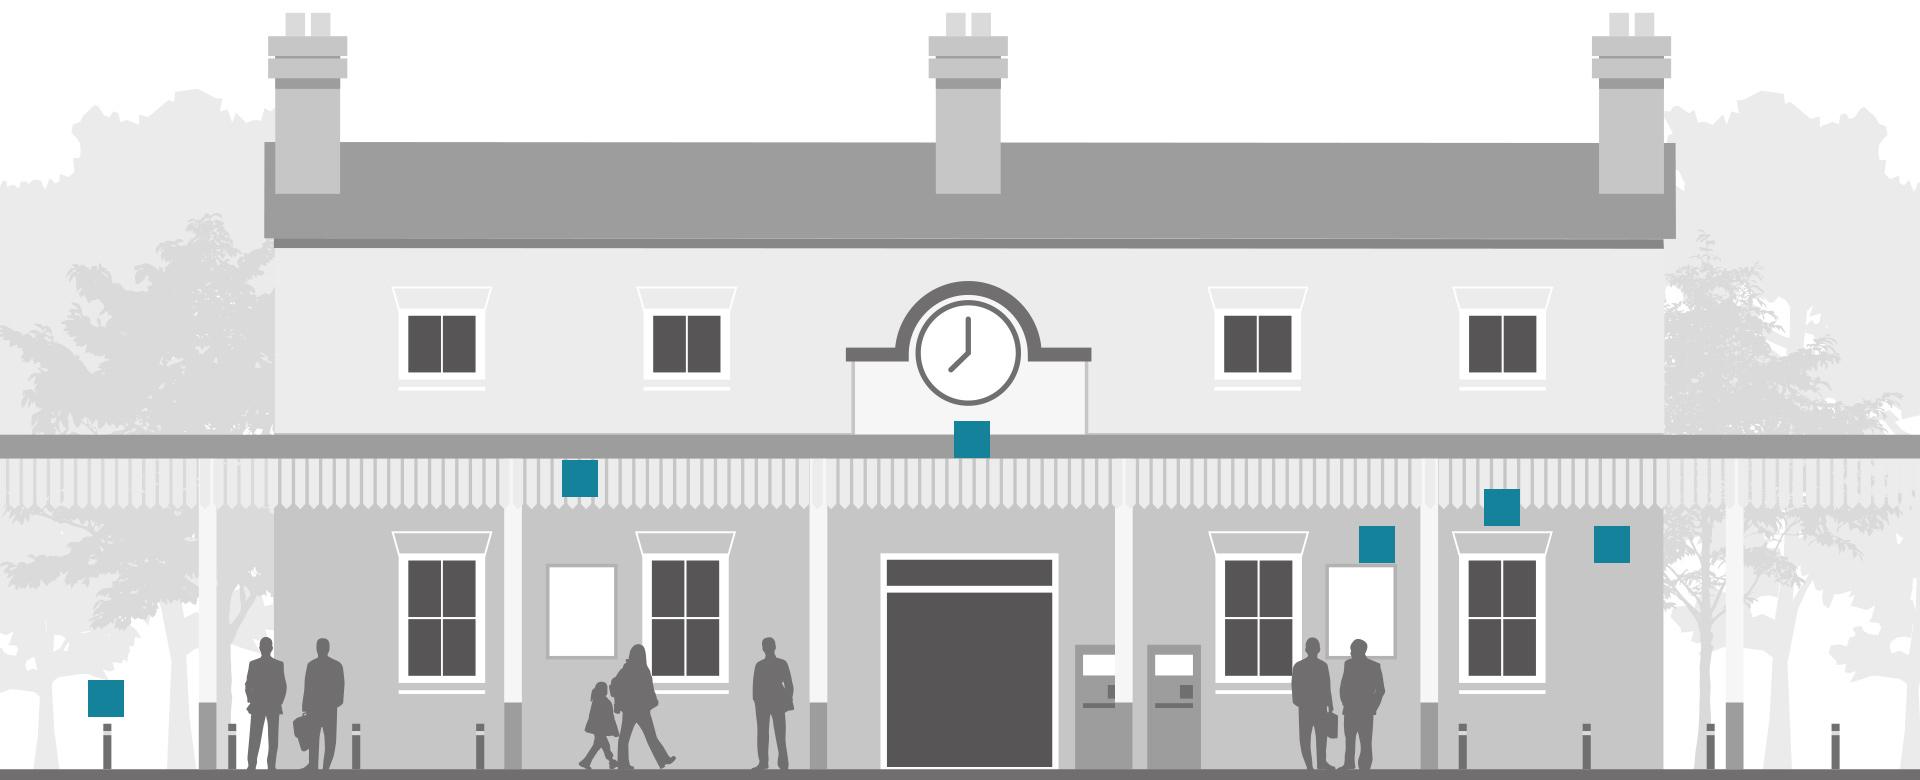 Transportapplications_station_forecourt